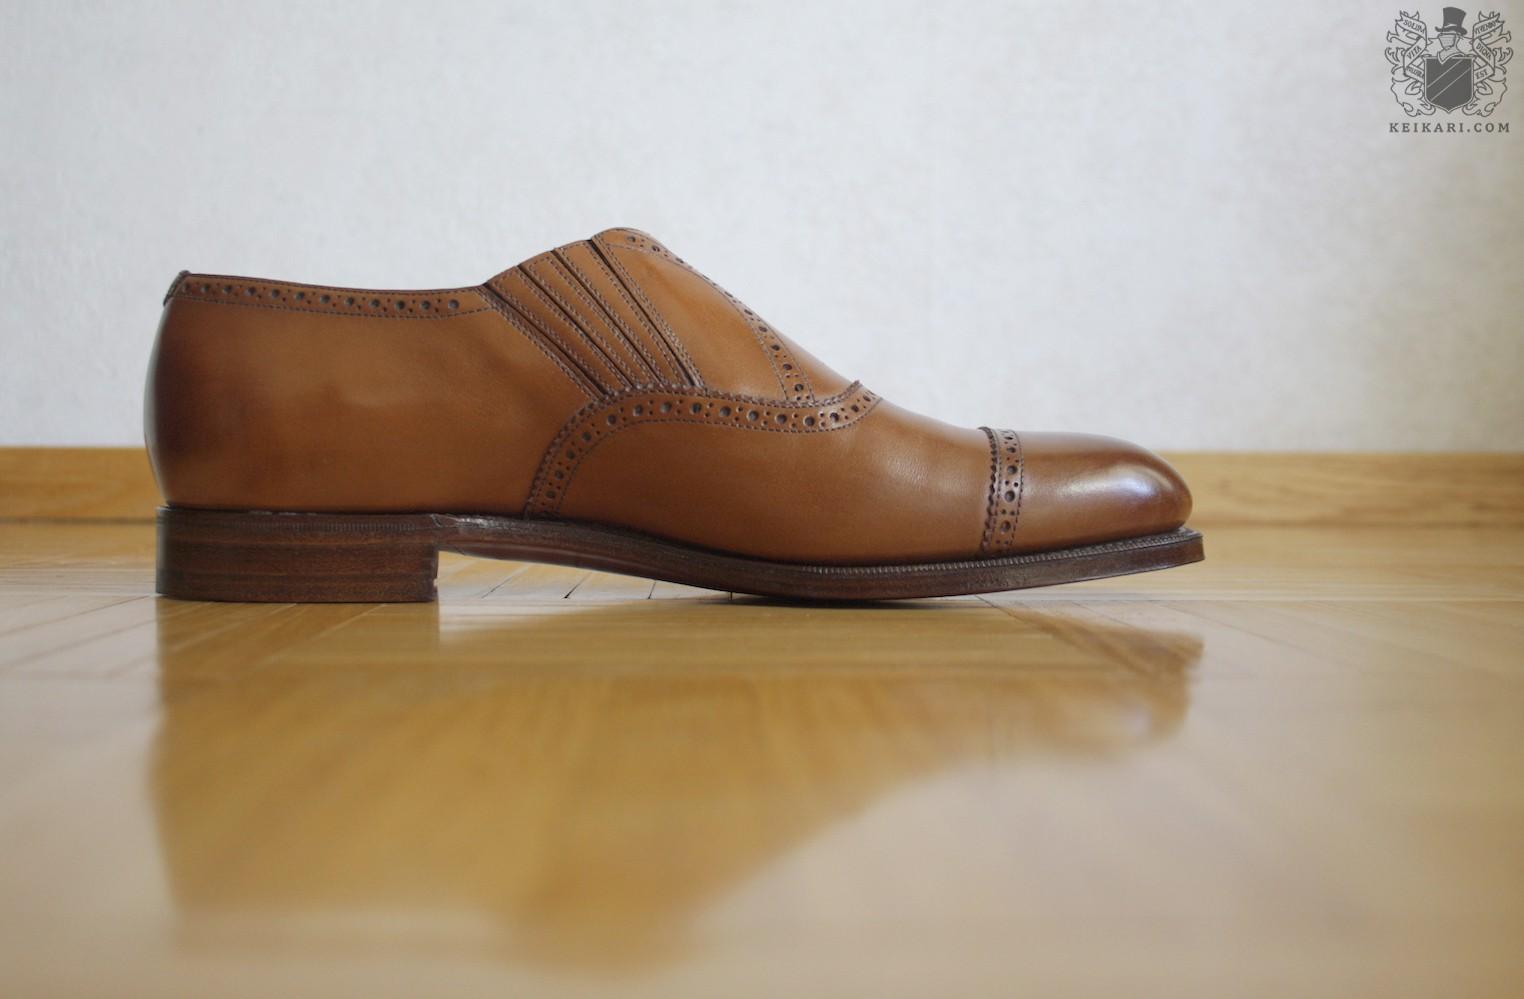 edward_green_kibworth_side_elastic_shoes_at_keikari_dot_com07